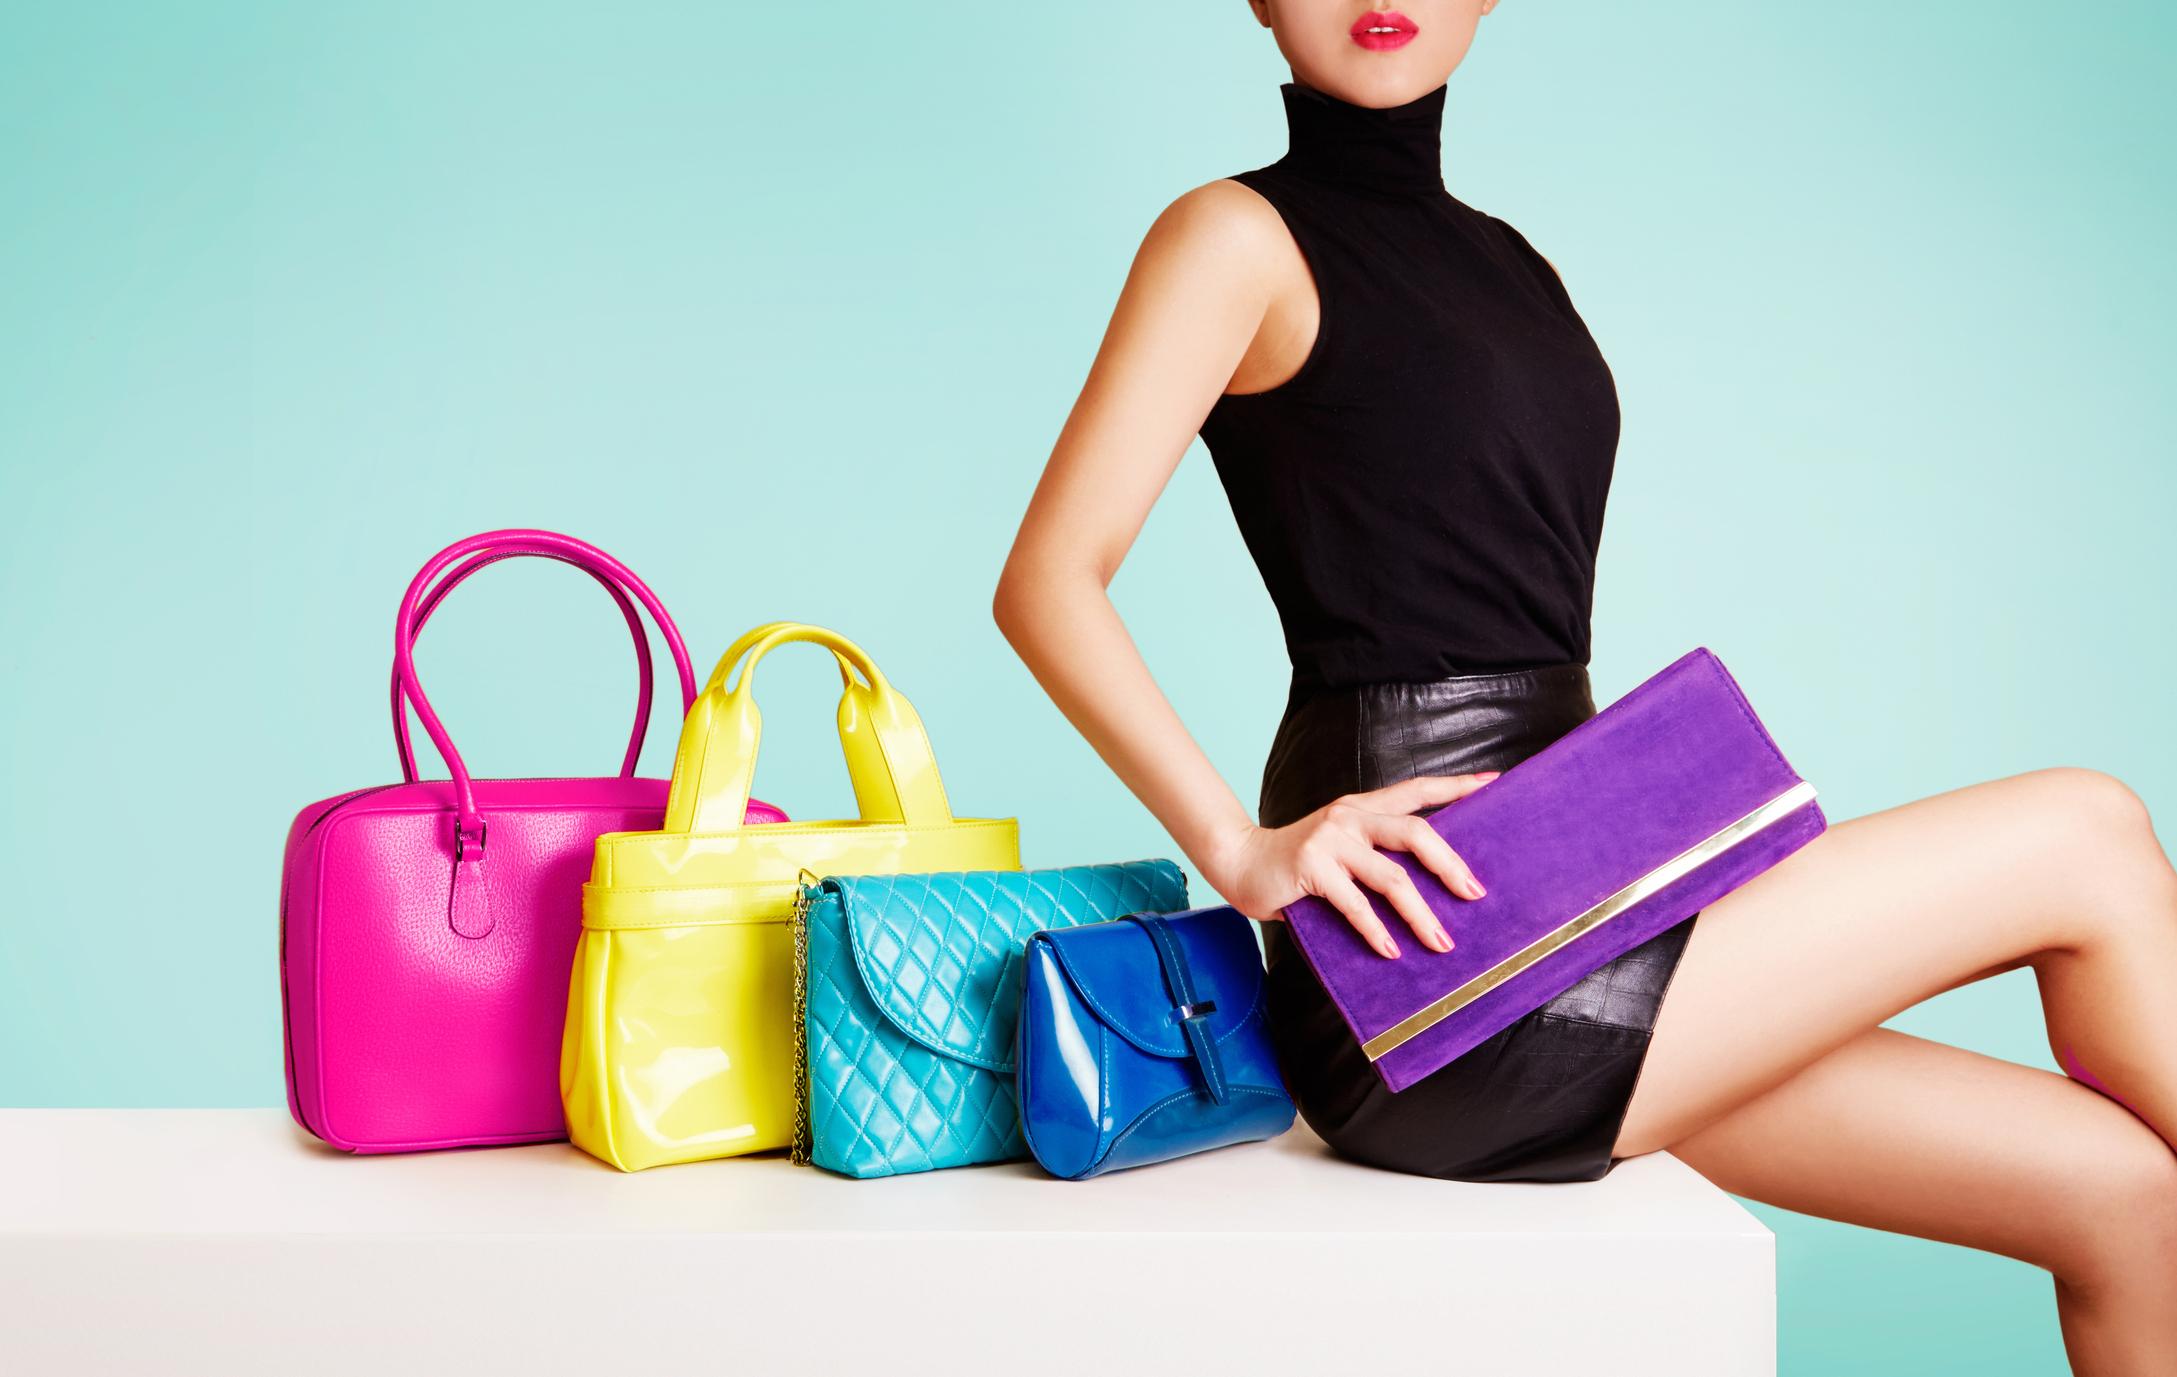 Woman wearing short, tight black dress seated beside colorful handbags